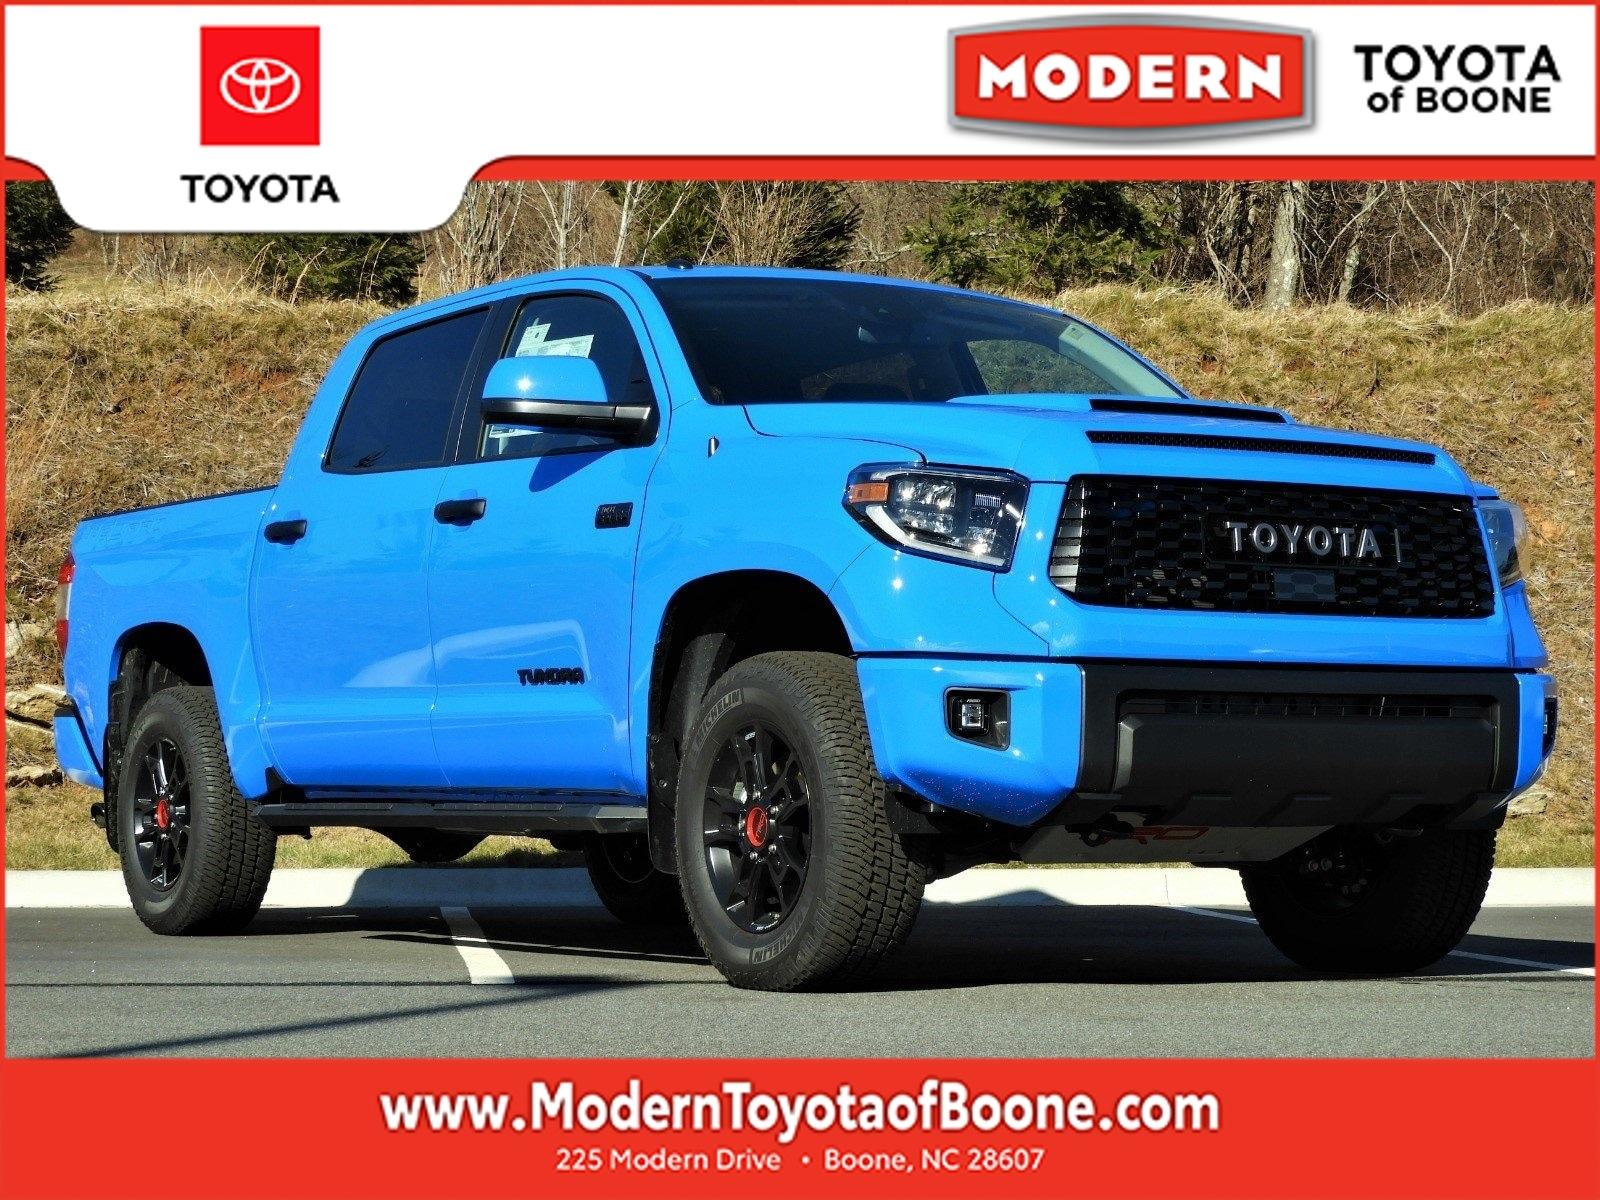 2019 Toyota Tundra TRD Pro 5 7L V8 Truck CrewMax